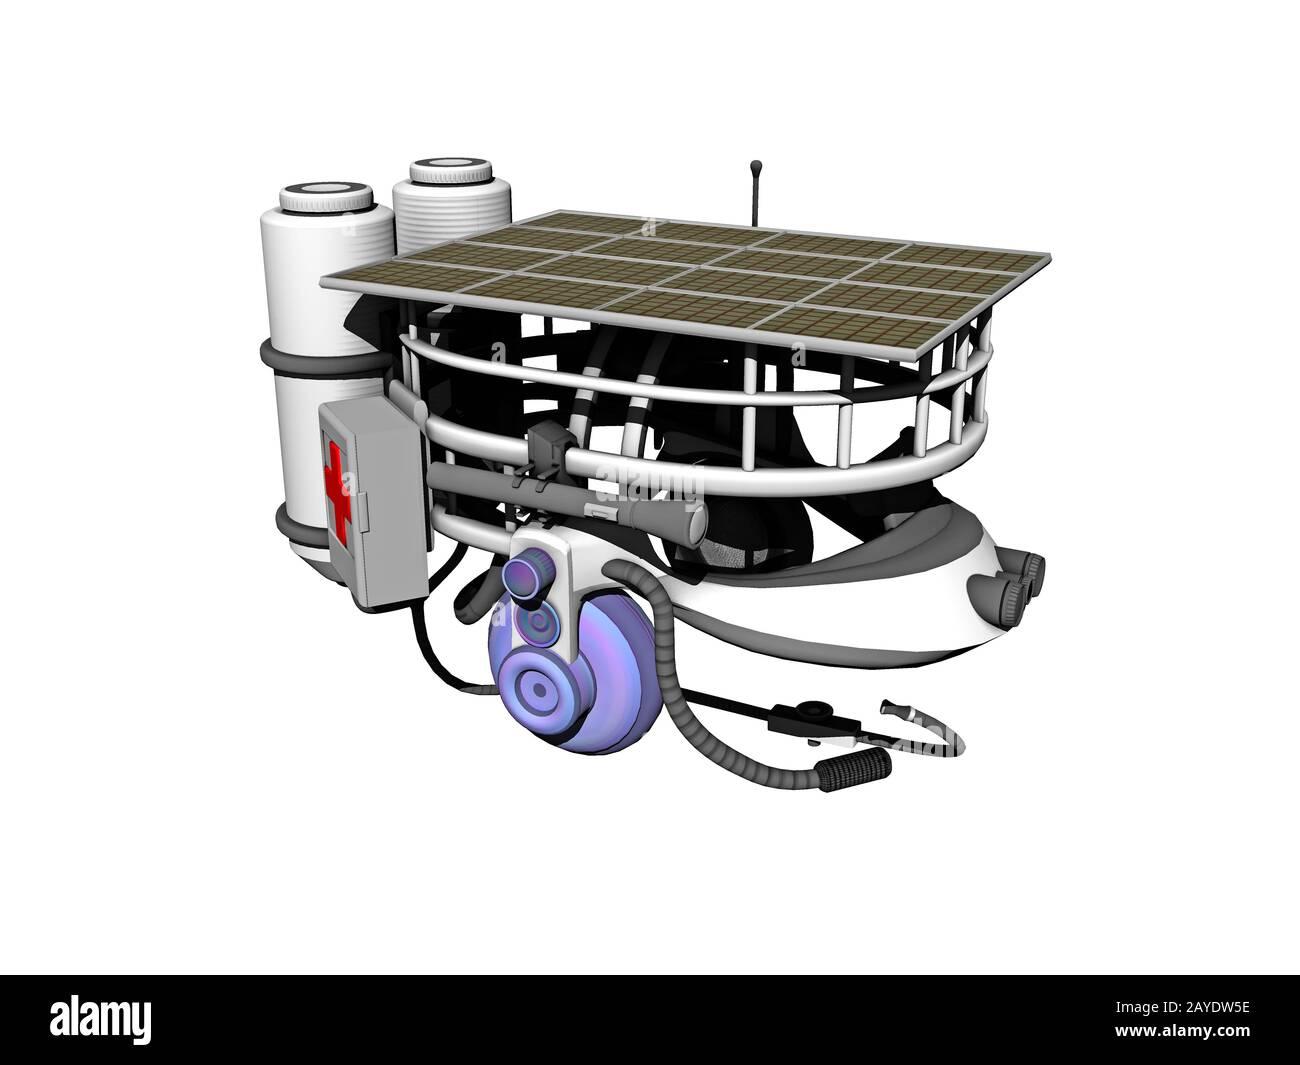 Solar helmet with headphones and microphone Stock Photo